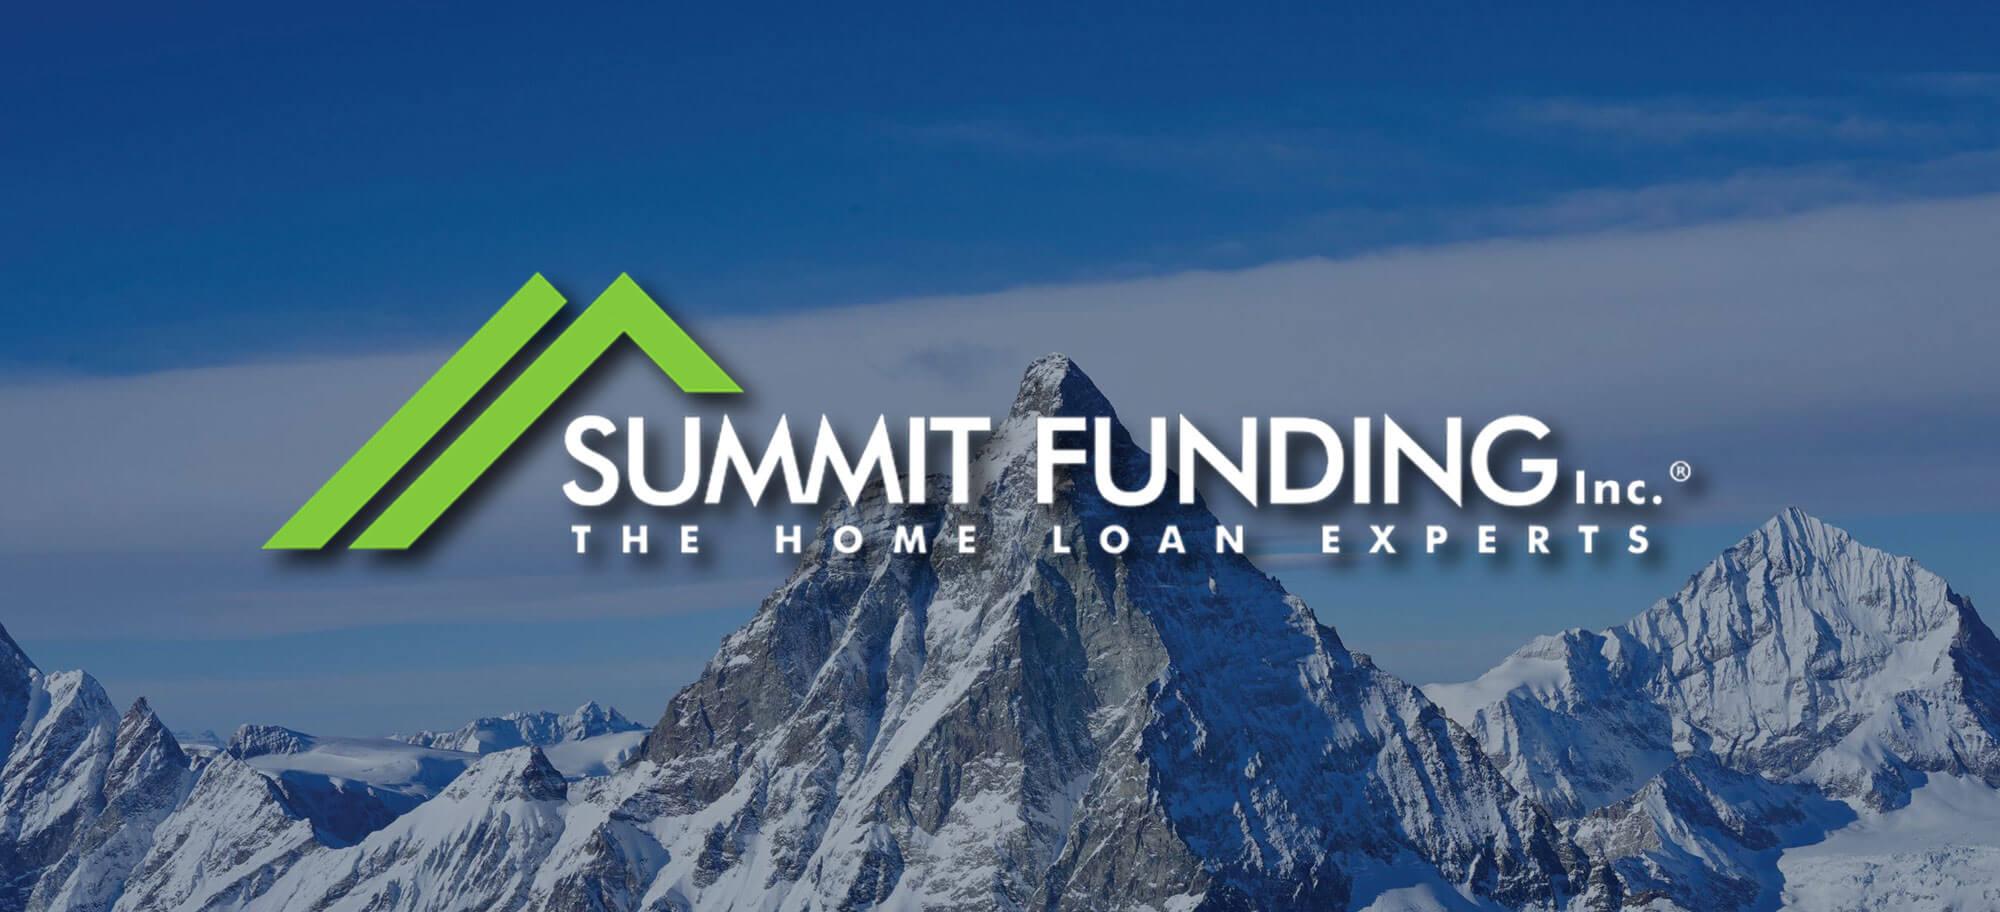 Summit Funding Inc logo